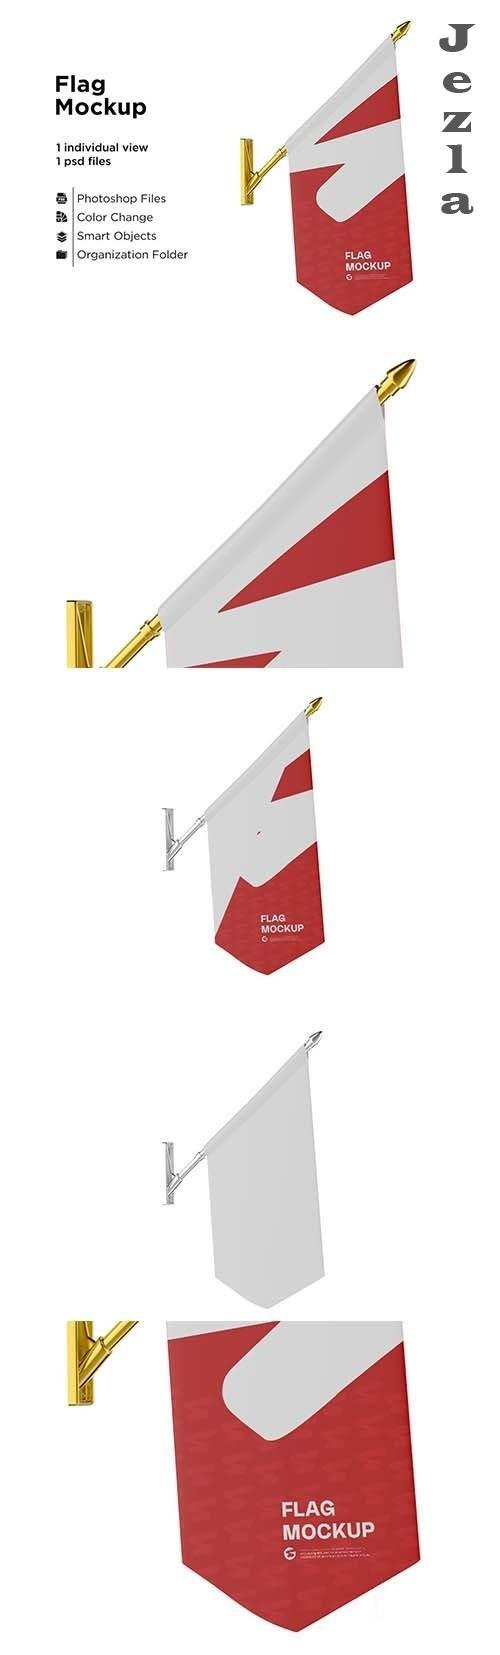 CreativeMarket - Flag Mockup 6063308